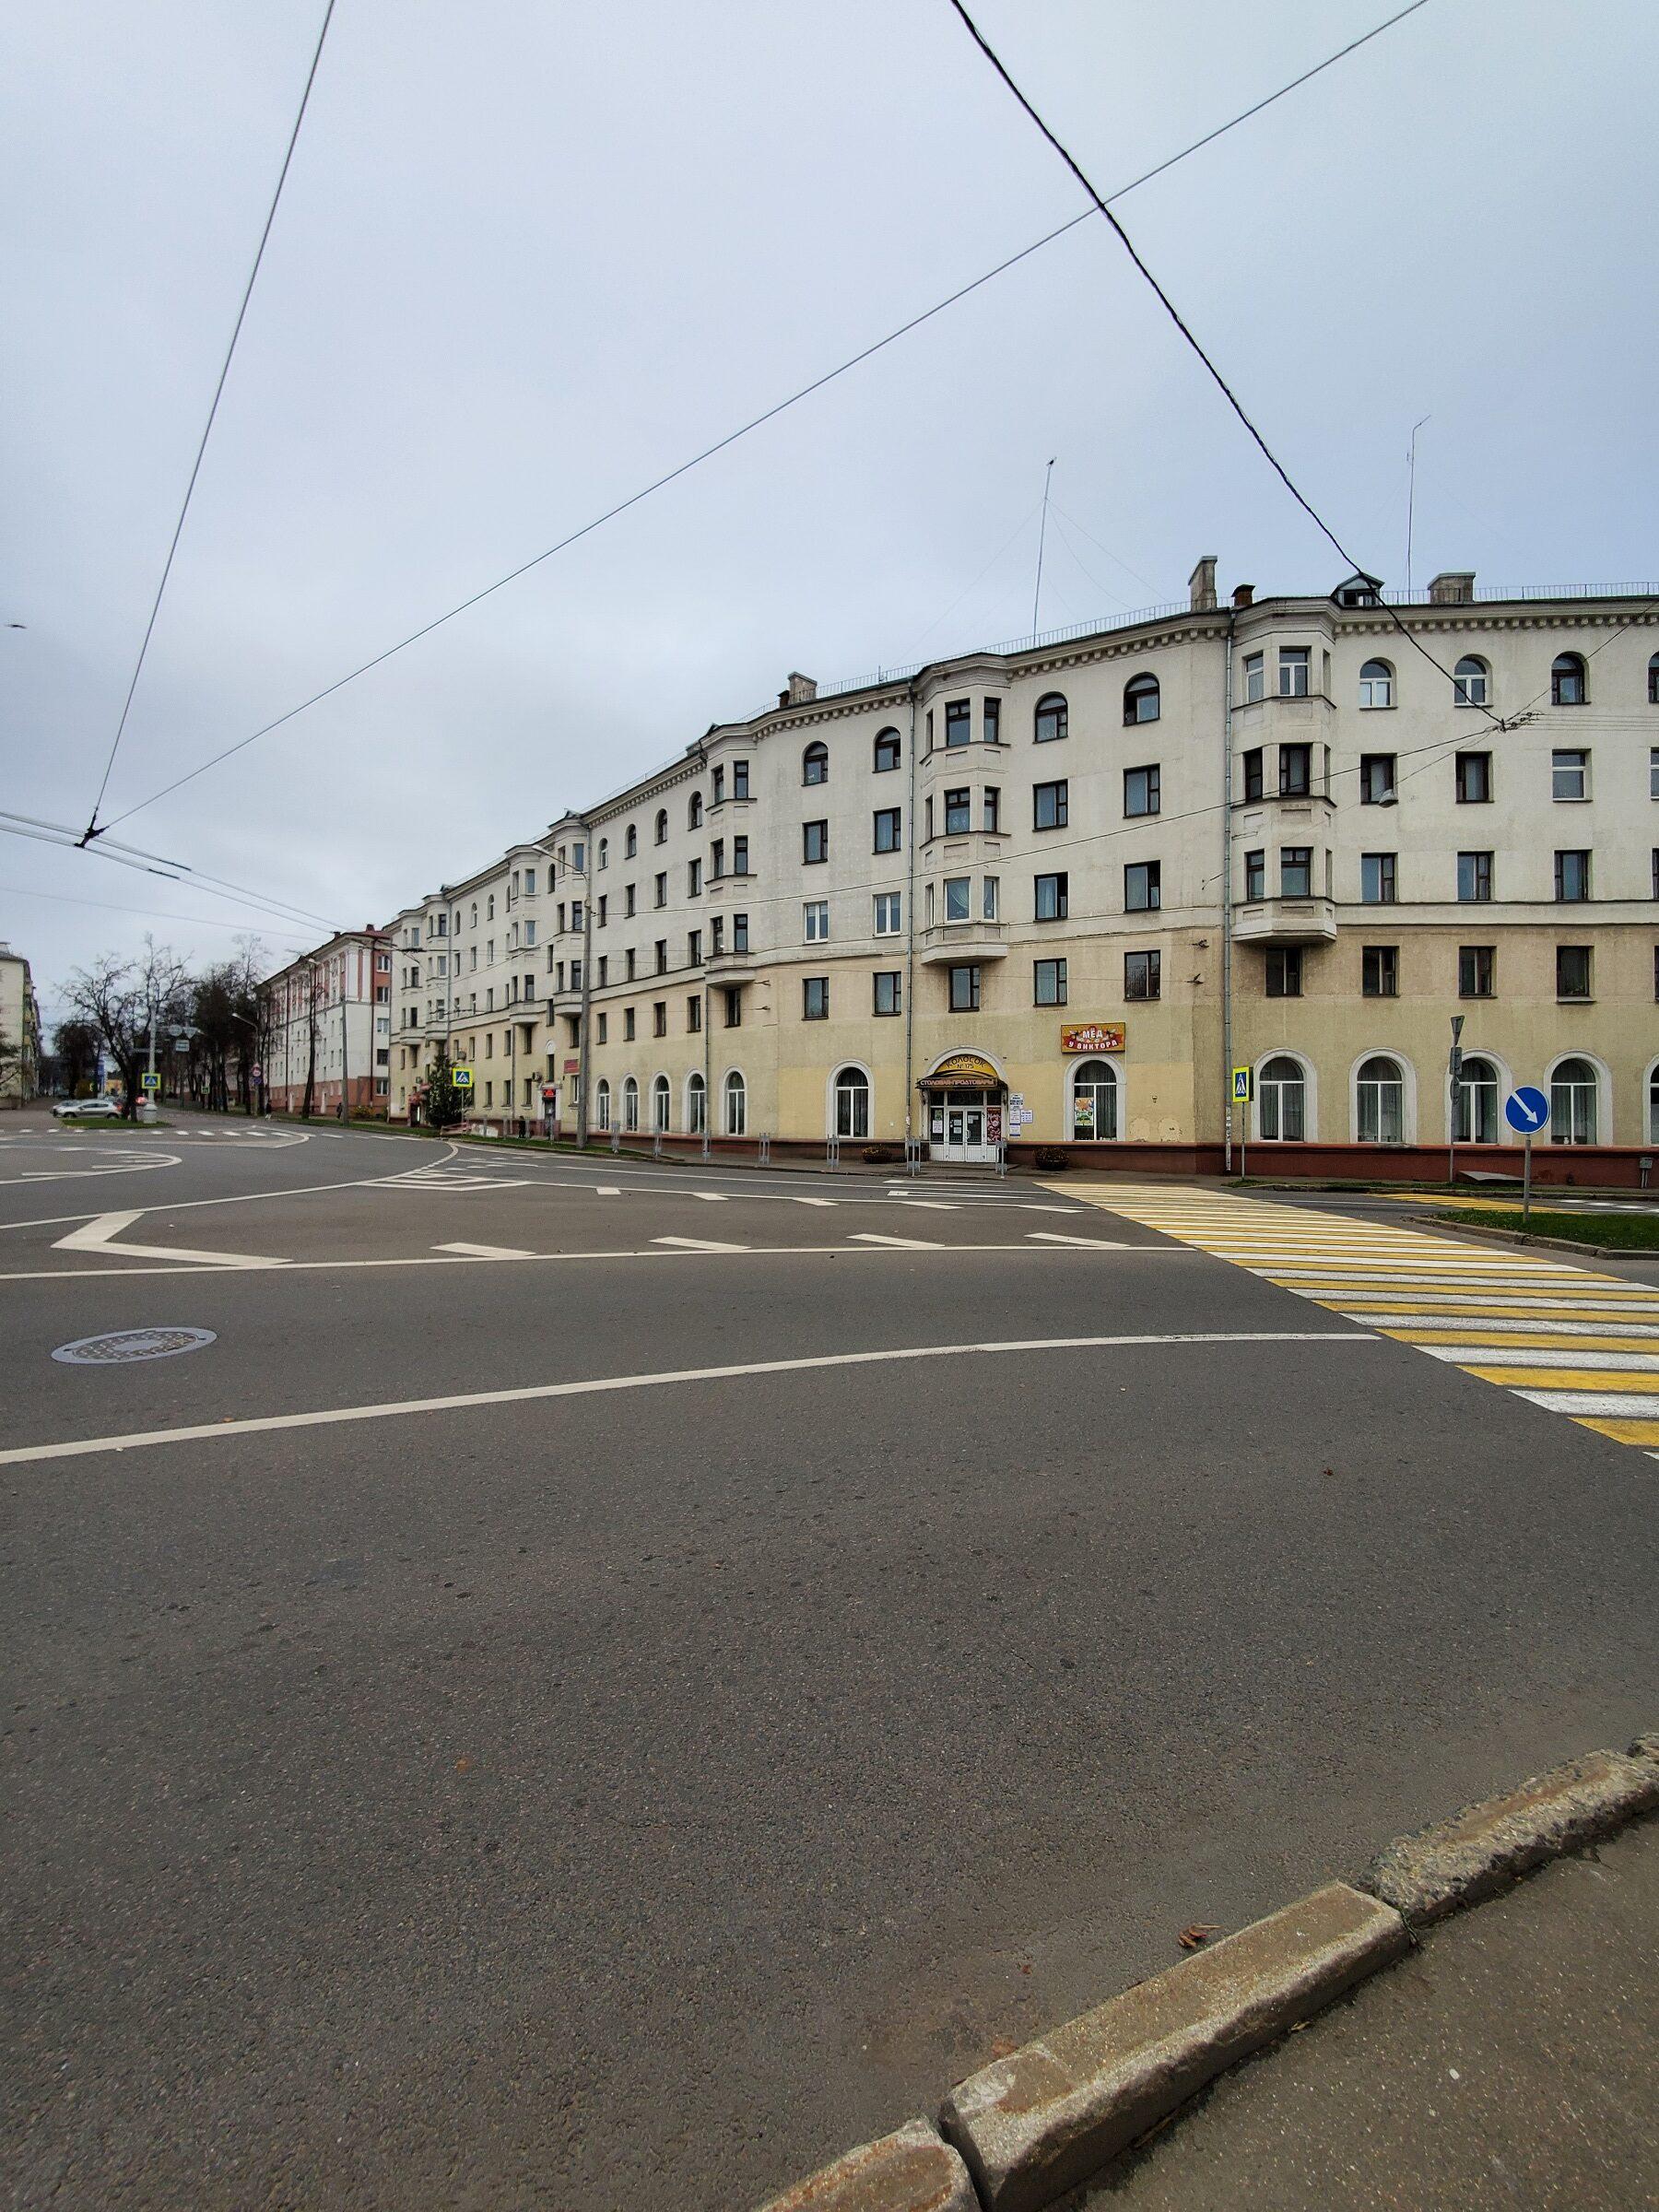 20201107 151201 rotated - Минск. Тракторозаводской поселок